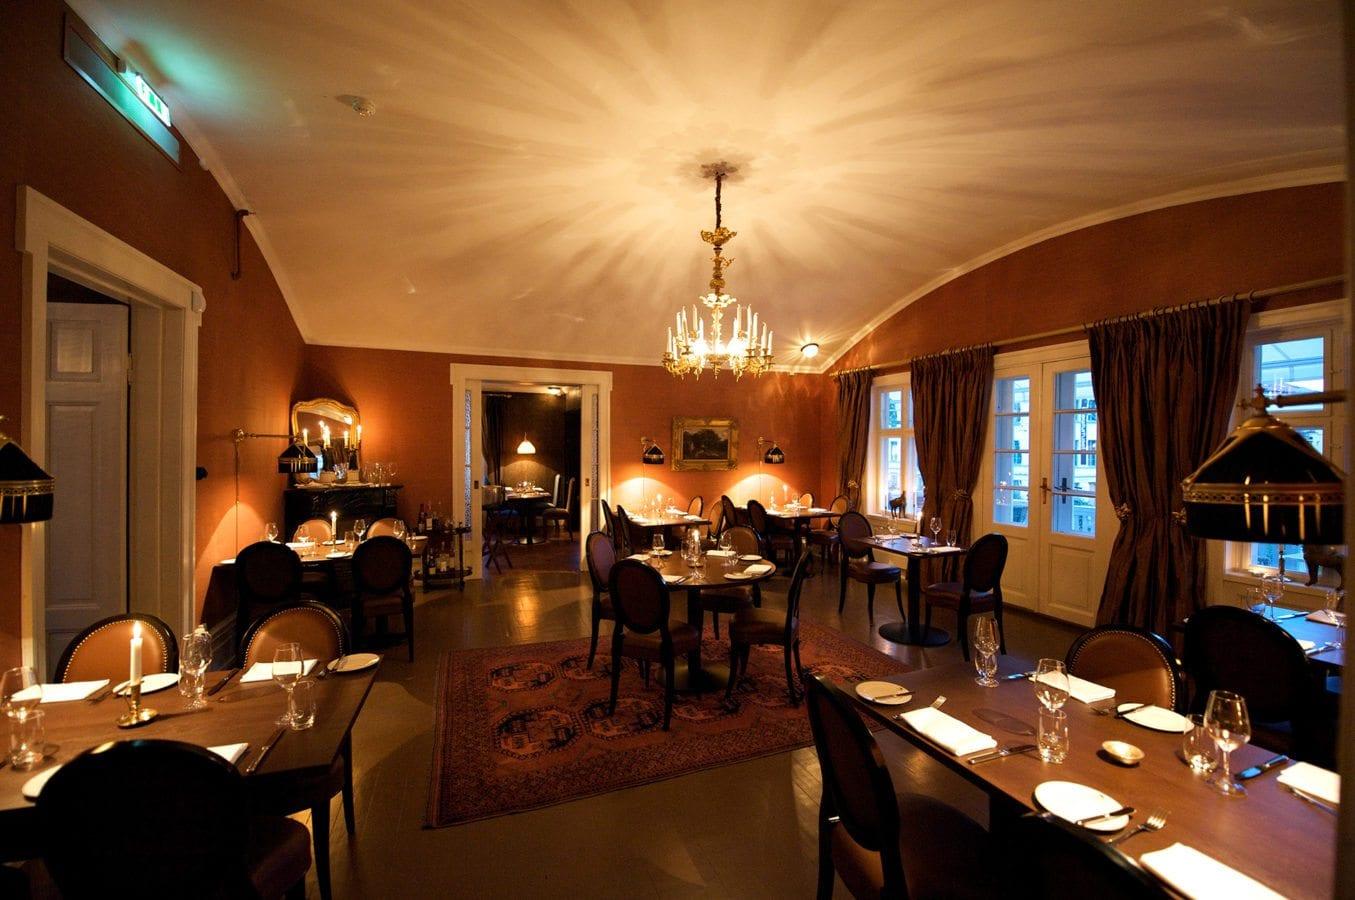 massasje escort romantisk restaurant i oslo